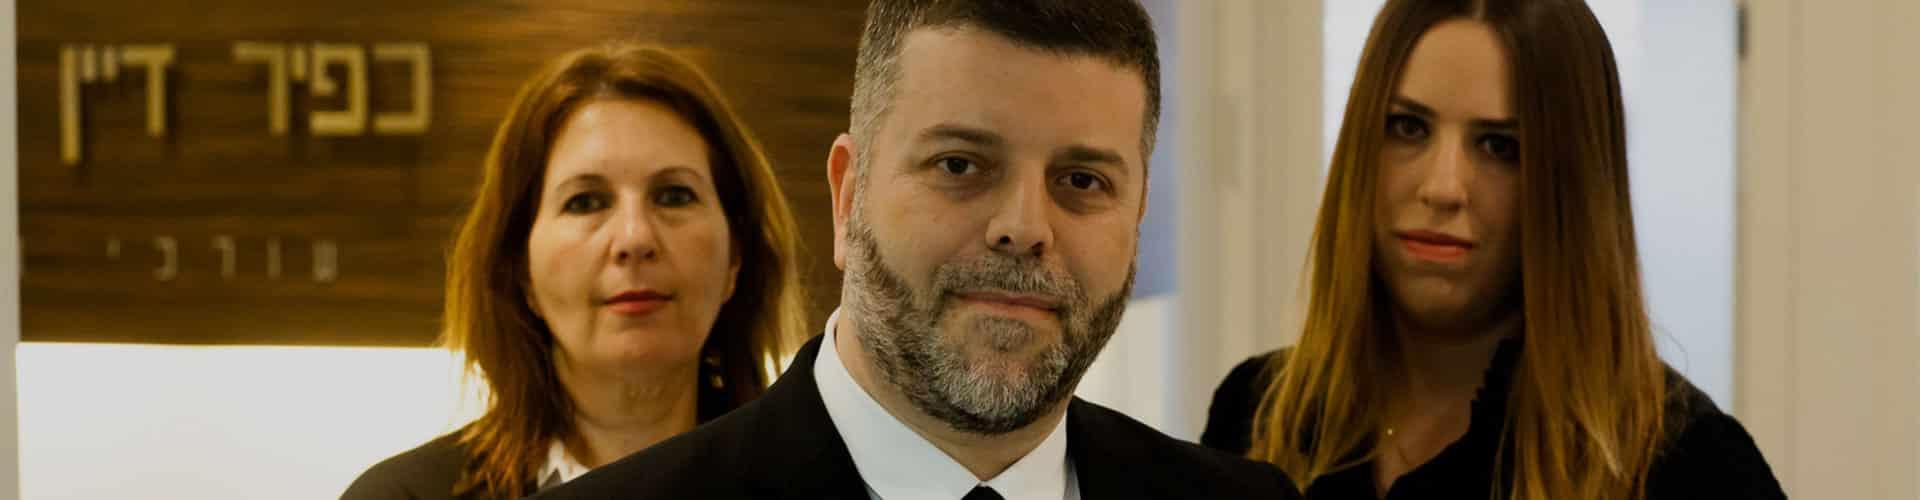 עורכי דין דיני עבודה - כפיר דיין דובב ושות'